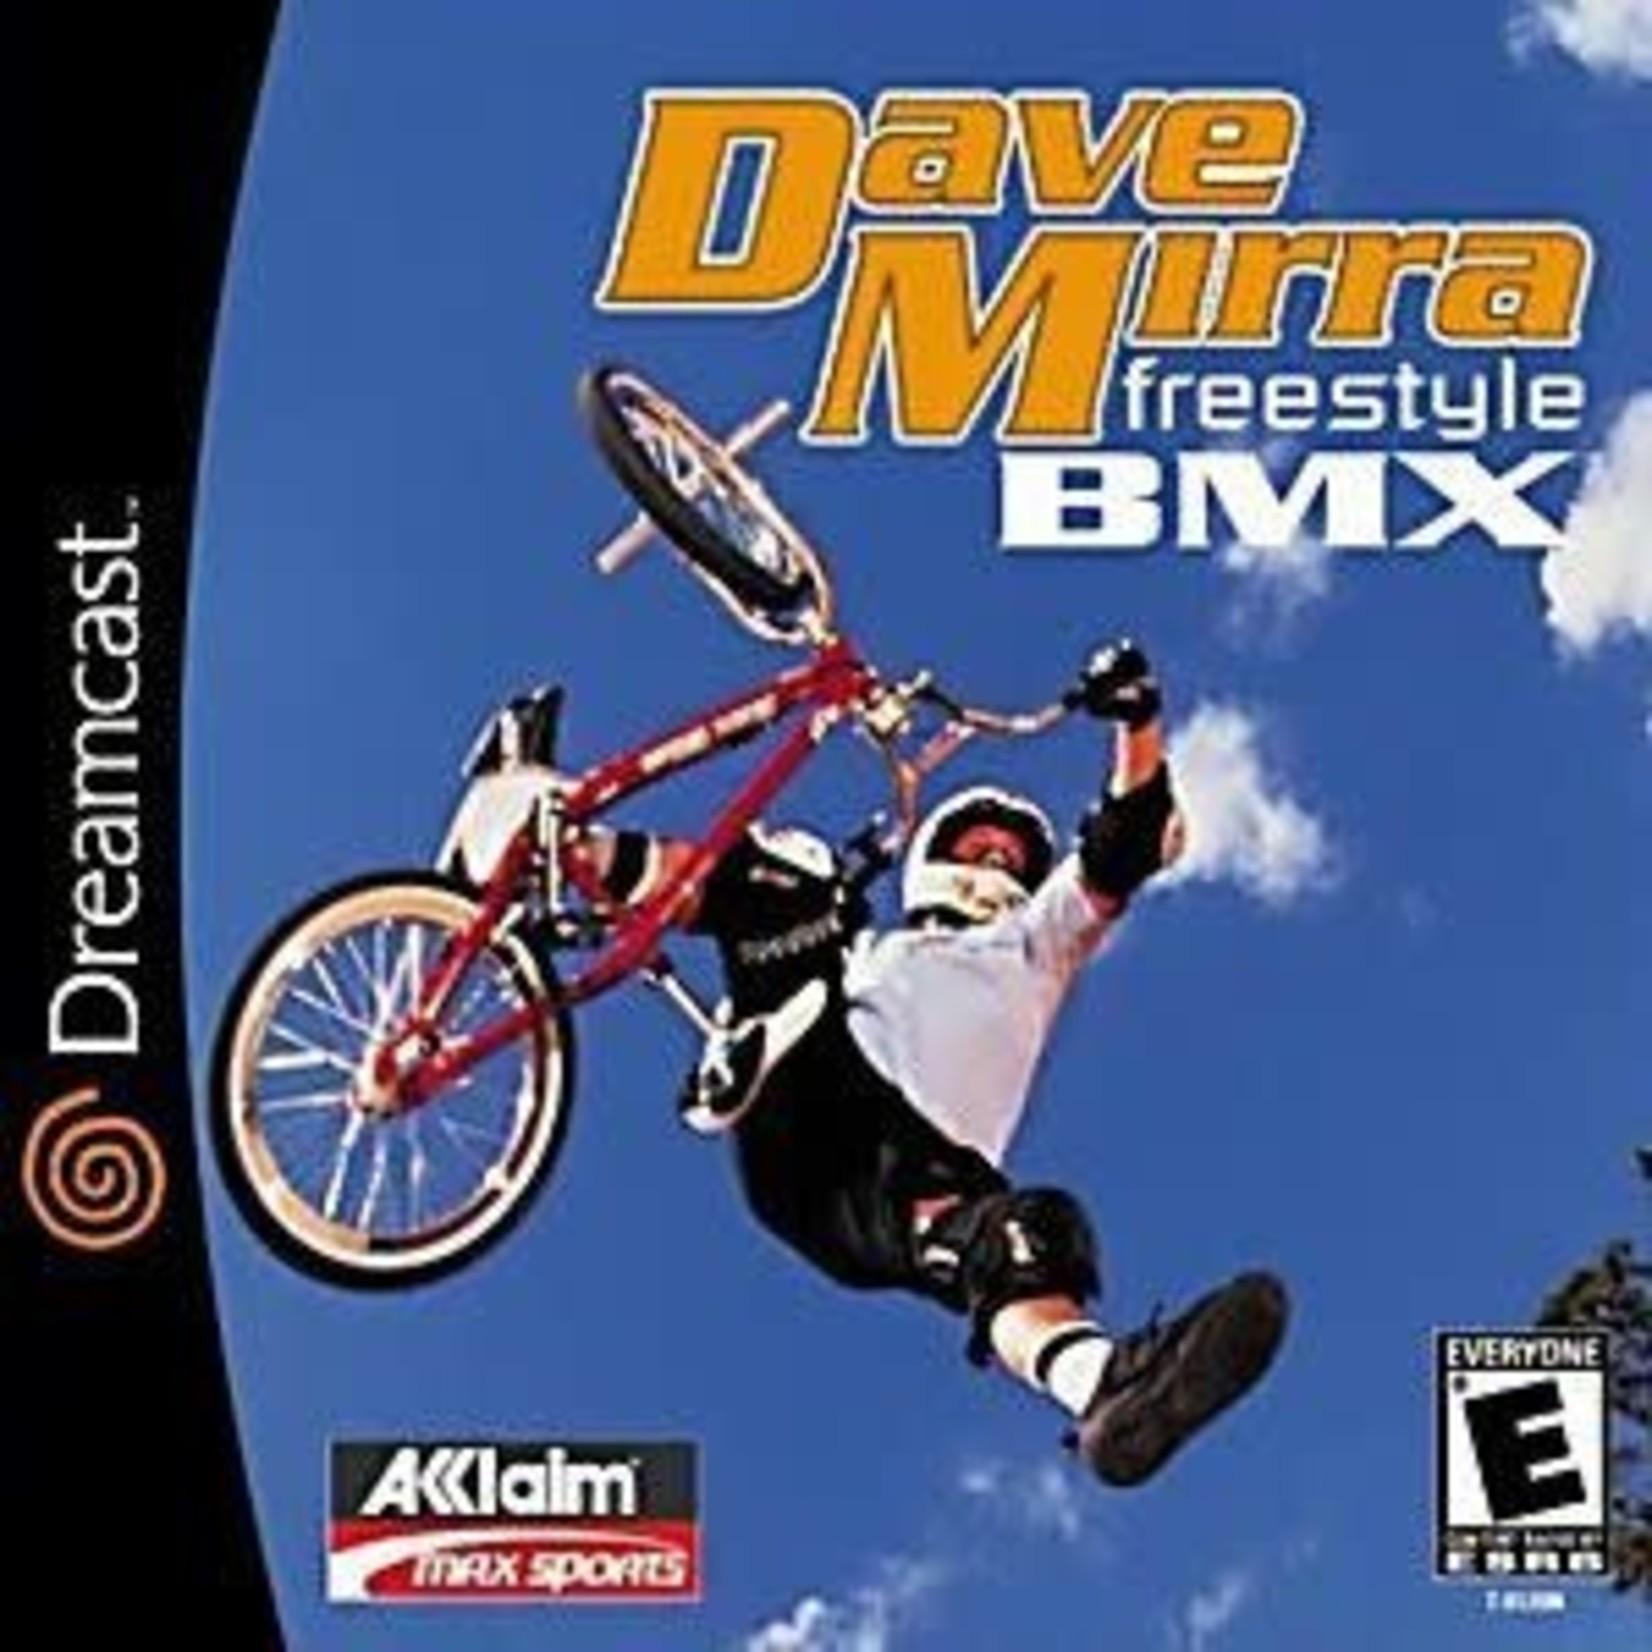 SDCU-Dave Mirra Freestyle BMX